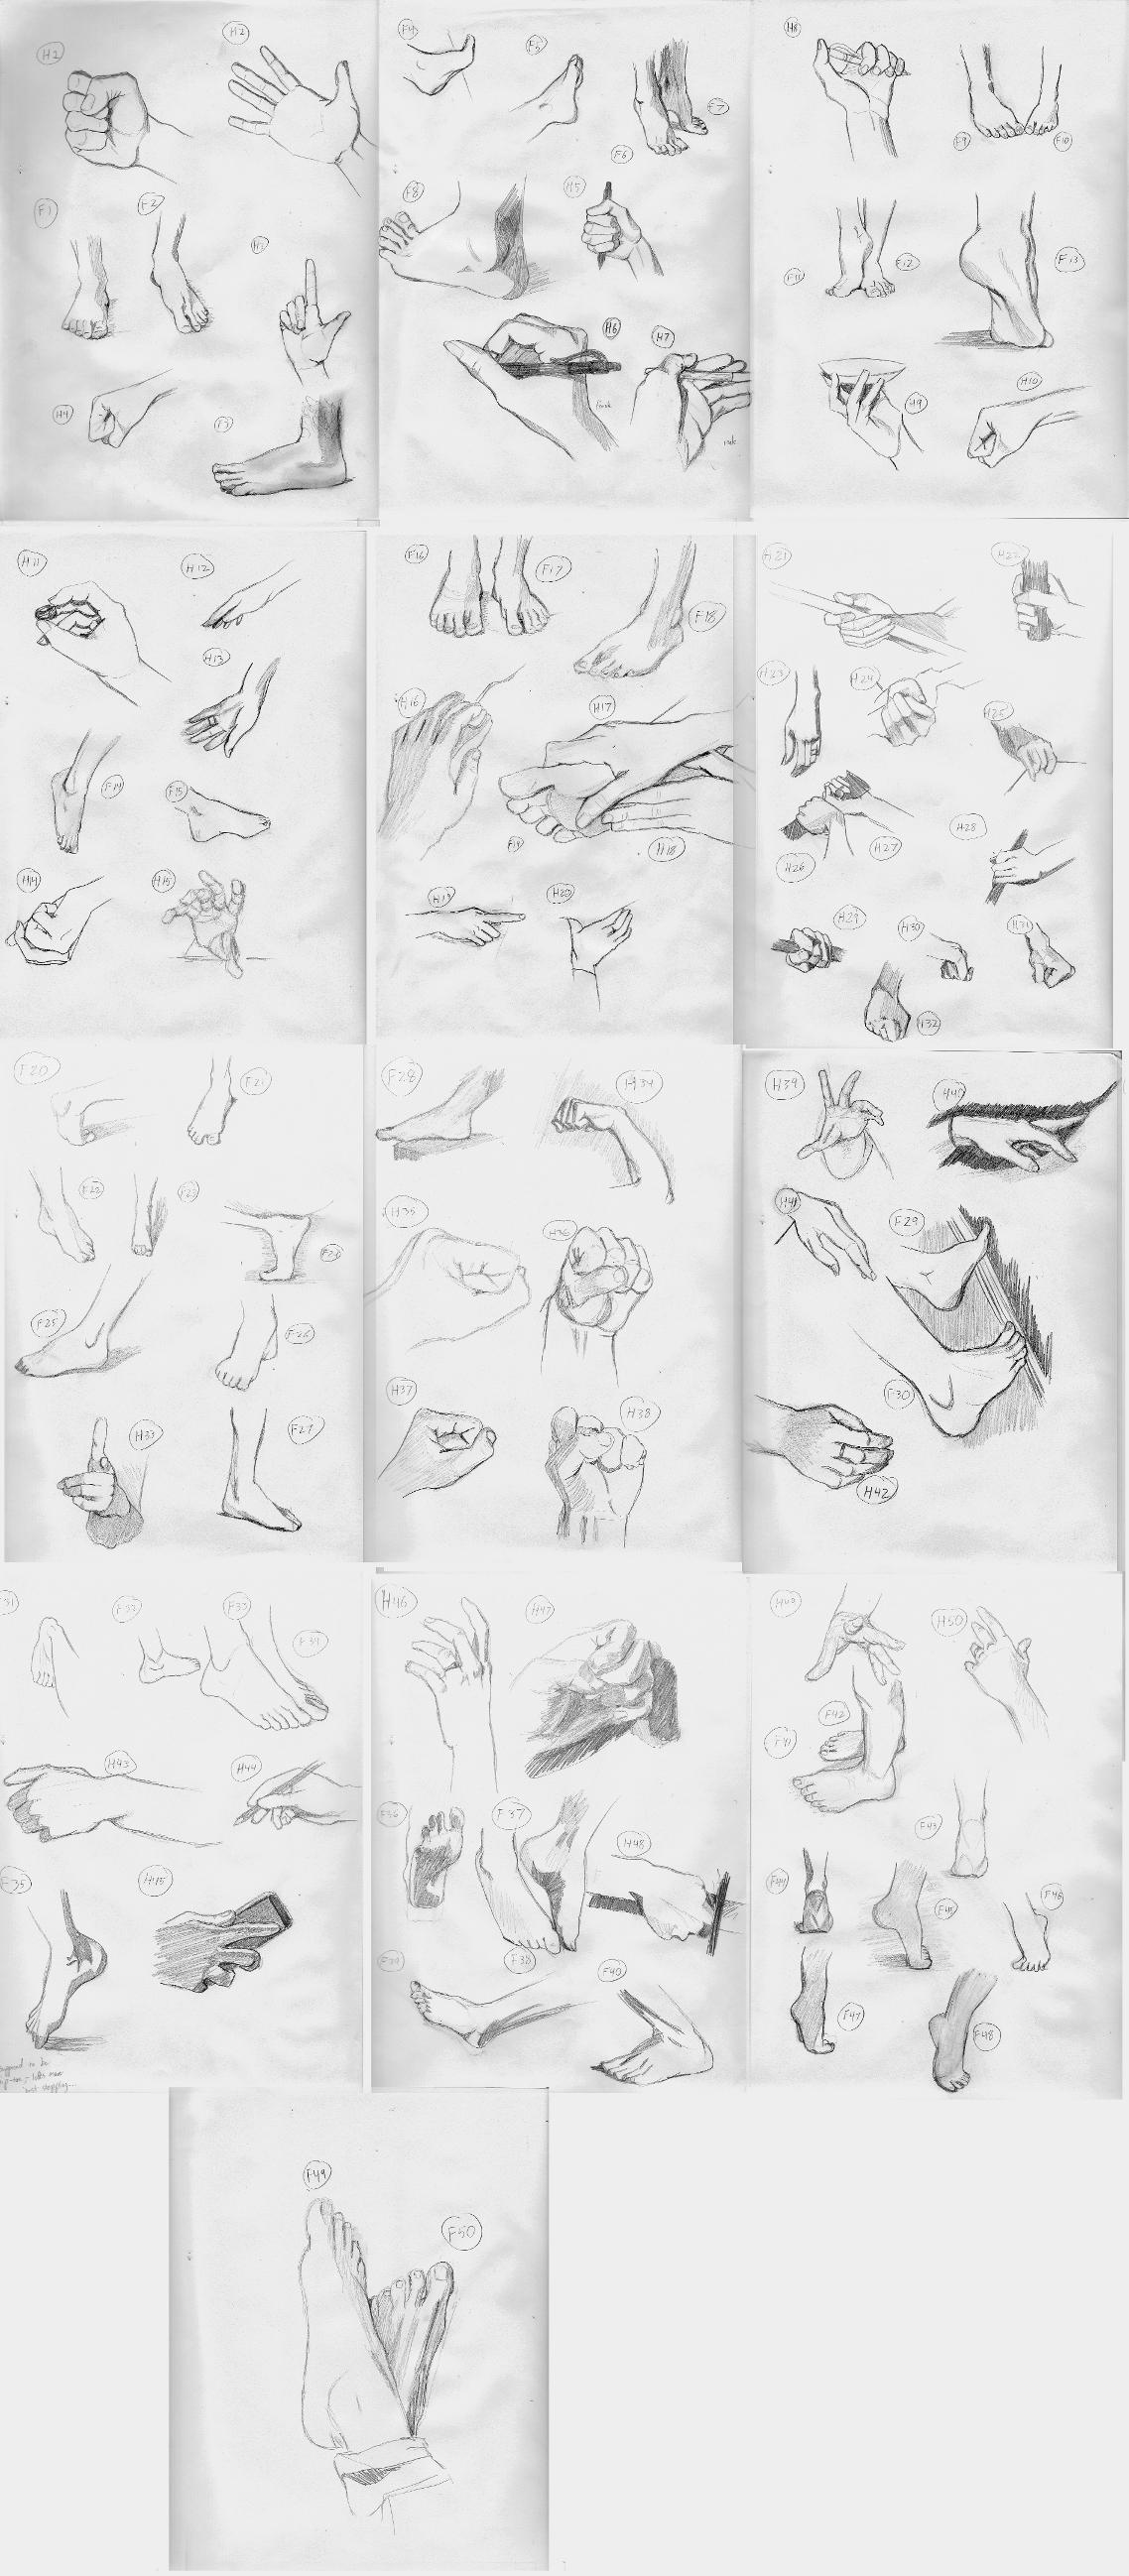 50 Hands / 50 Feet Challenge by MichaelHoweArts